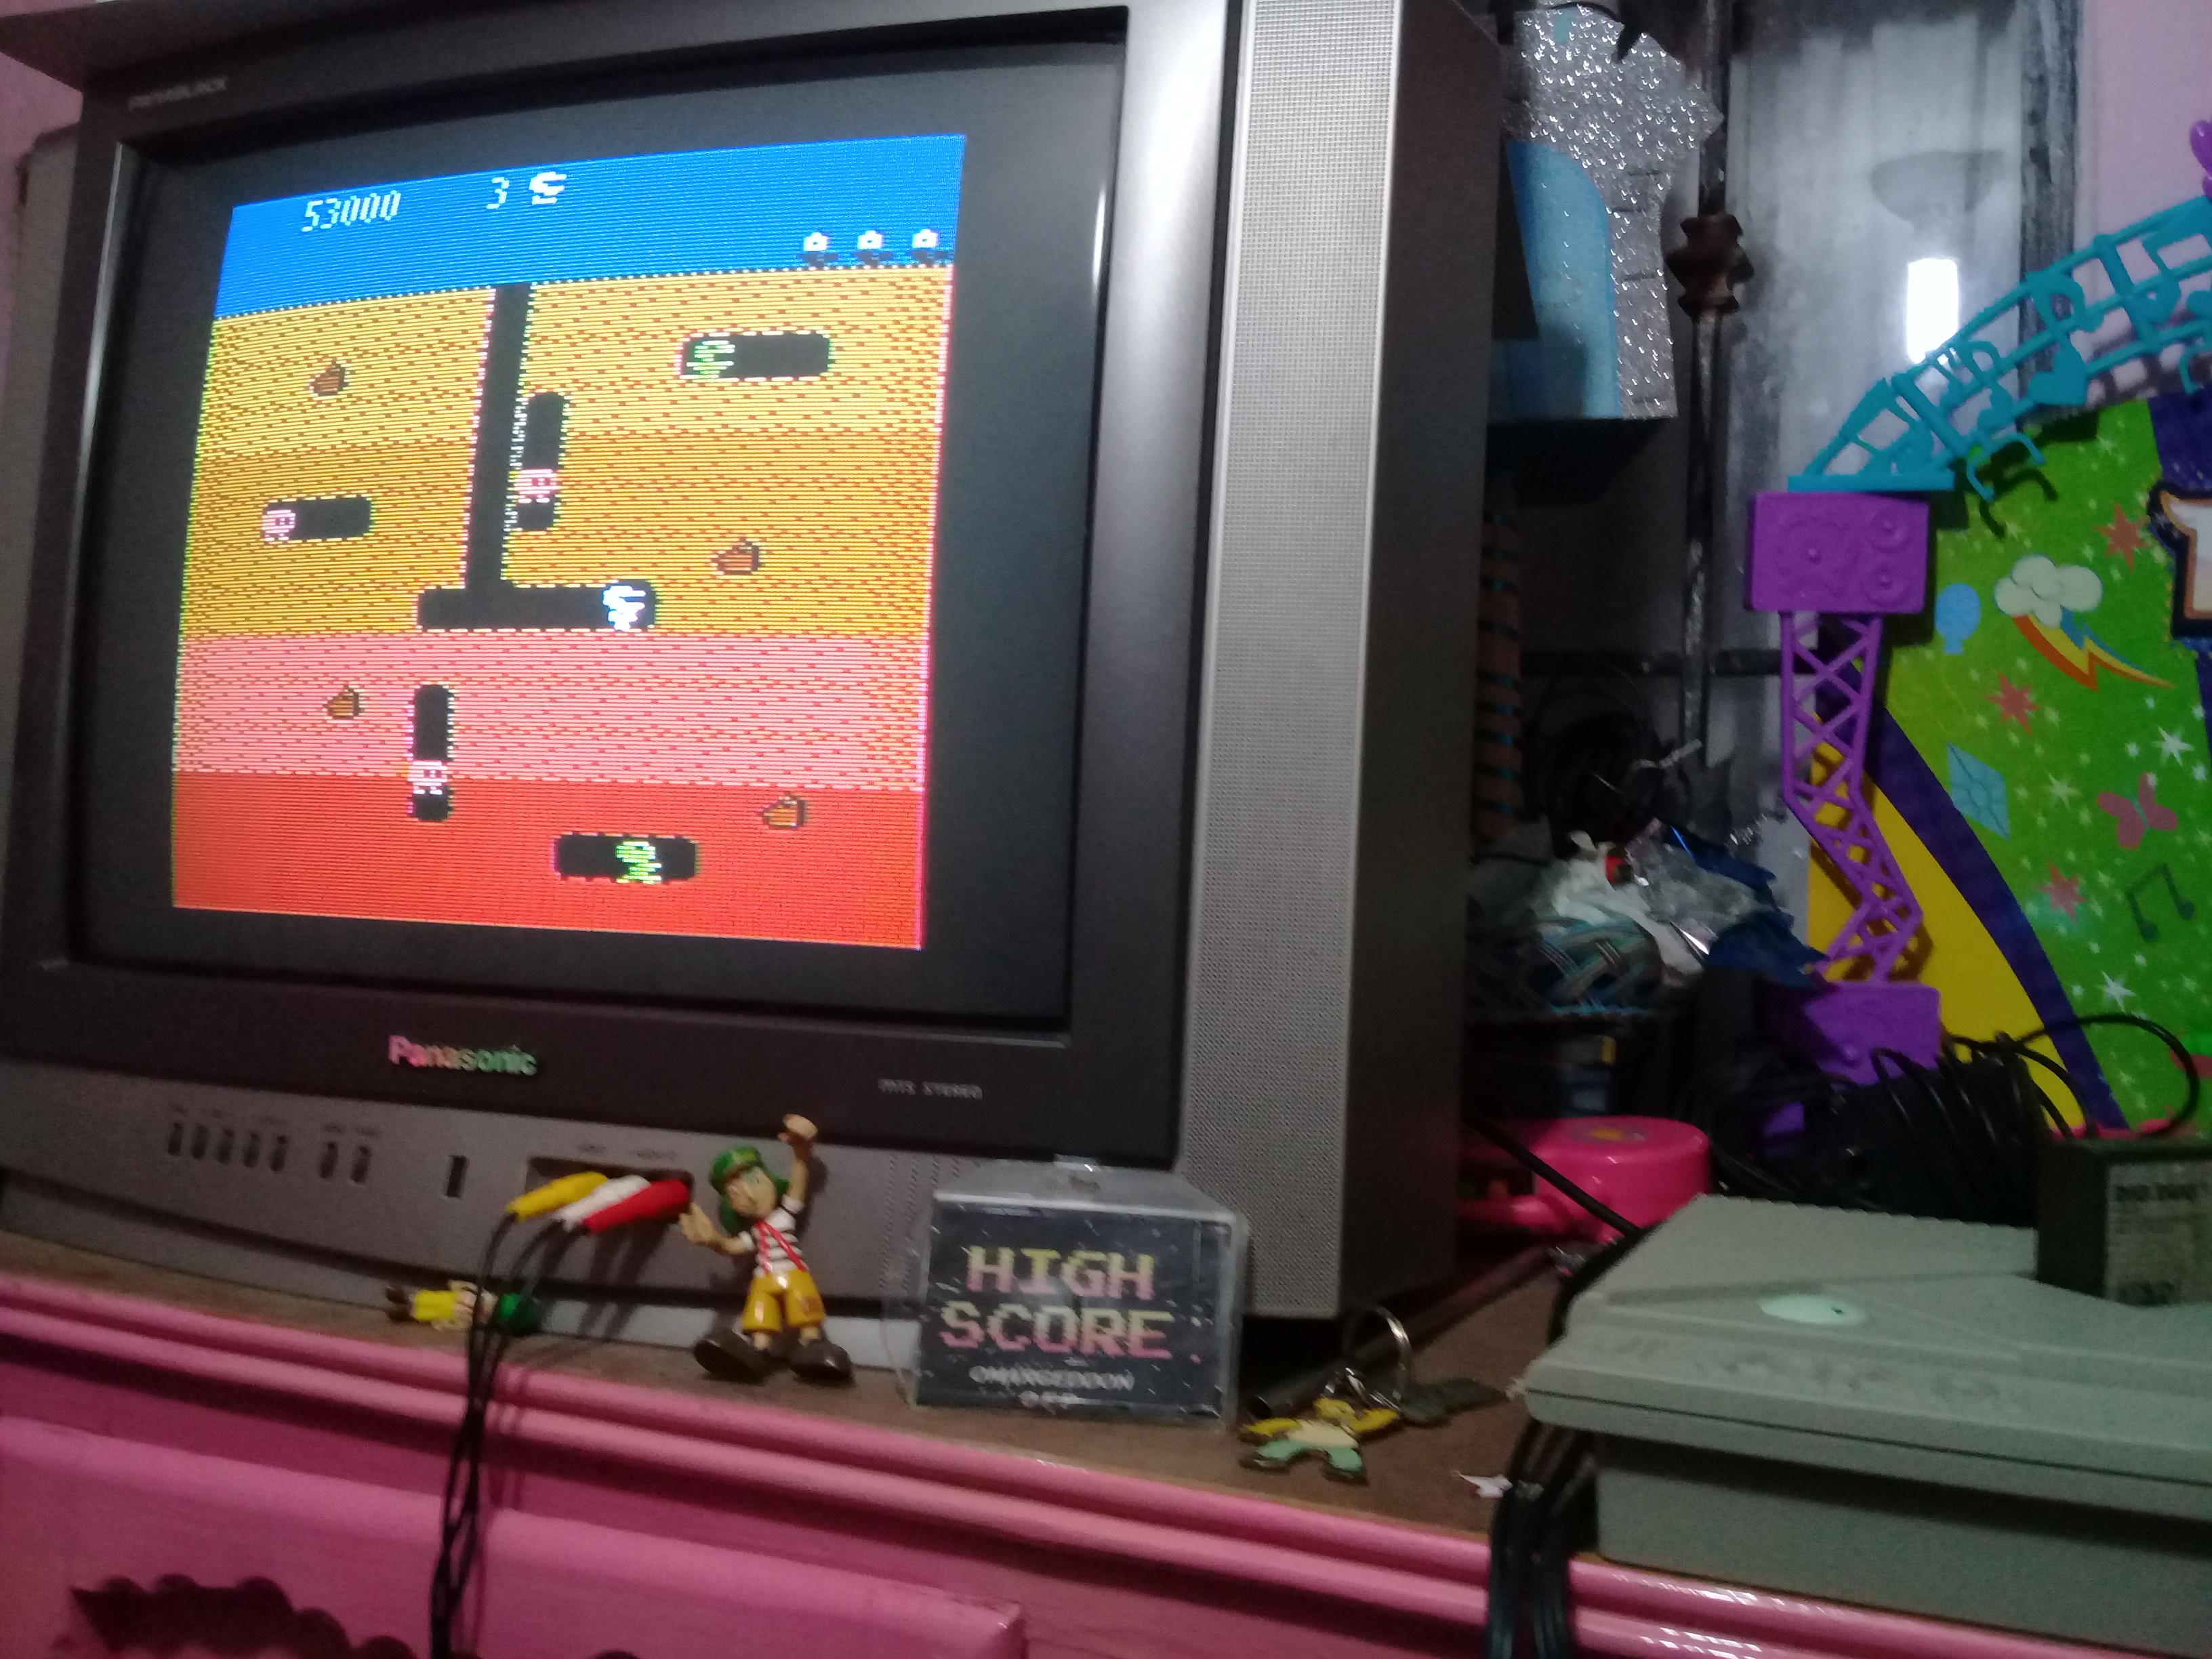 omargeddon: Dig Dug [Mushroom Start] (Atari 400/800/XL/XE) 53,000 points on 2019-01-08 18:11:44